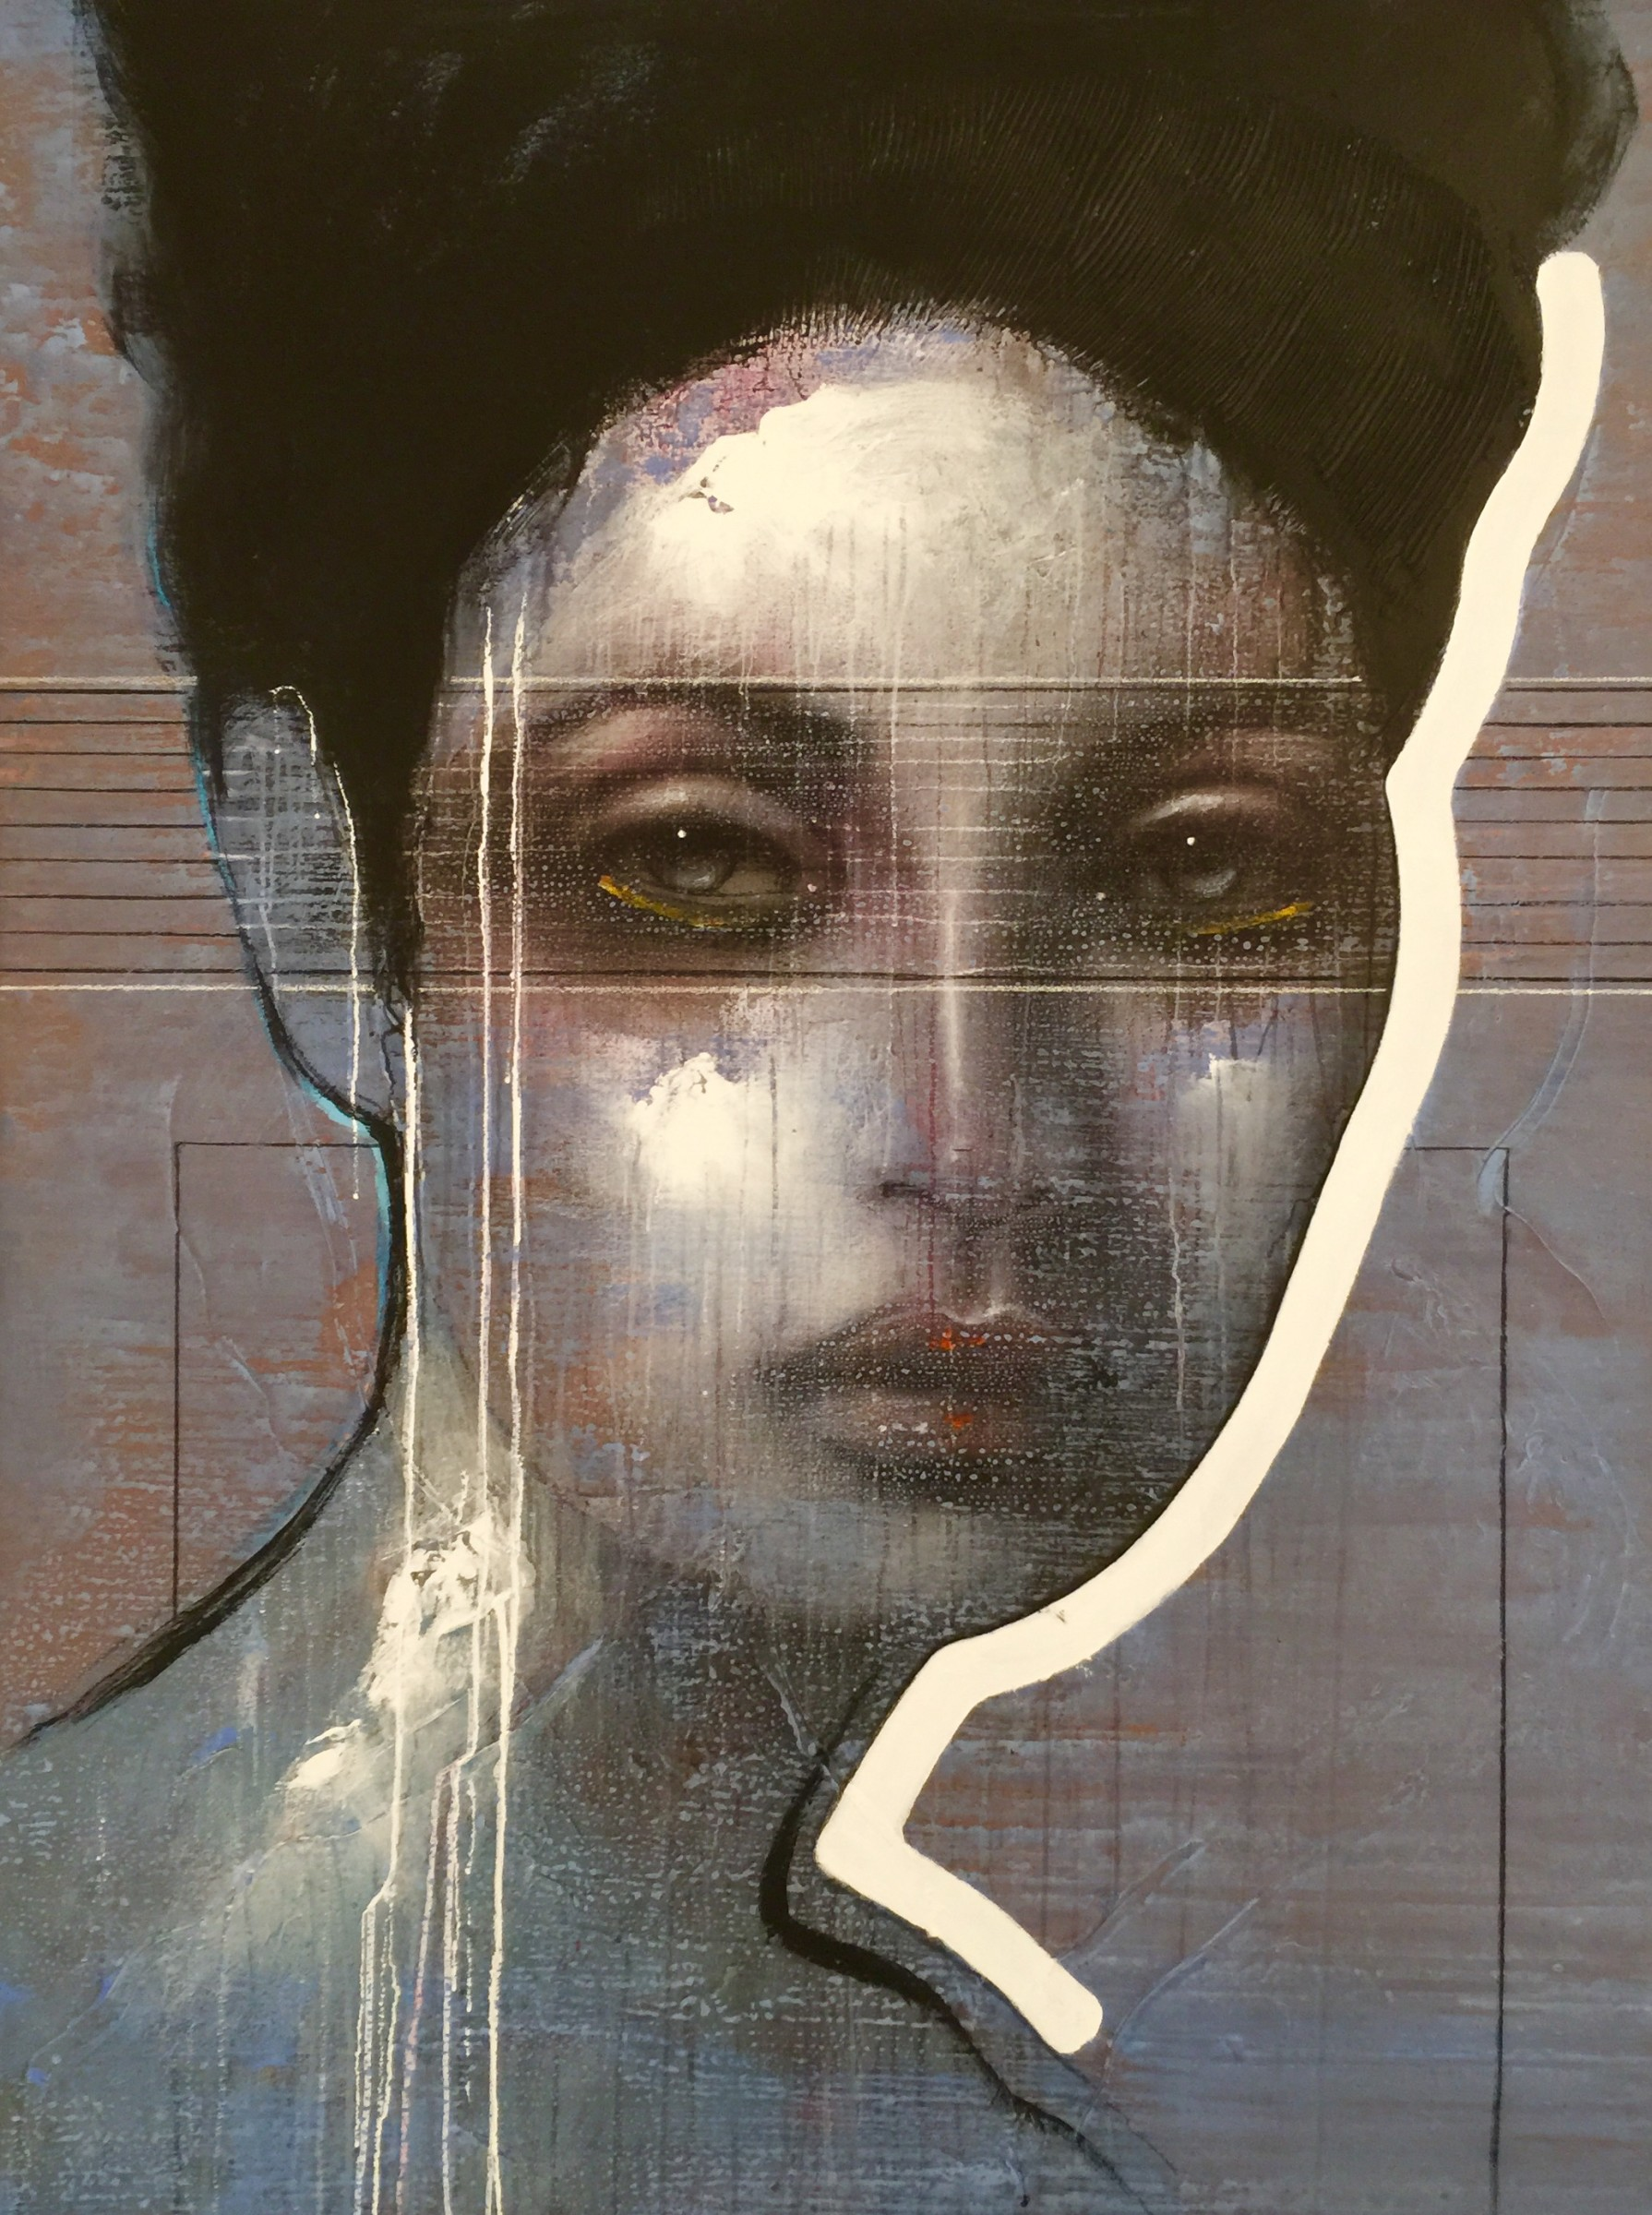 <span class=&#34;link fancybox-details-link&#34;><a href=&#34;/artists/40-ger-doornink/works/4425-ger-doornink-little-blue-2017/&#34;>View Detail Page</a></span><div class=&#34;artist&#34;><strong>Ger Doornink</strong></div> <div class=&#34;title&#34;><em>Little Blue</em>, 2017</div> <div class=&#34;medium&#34;>Oil on canvas</div> <div class=&#34;dimensions&#34;>170 x 130 cm</div>